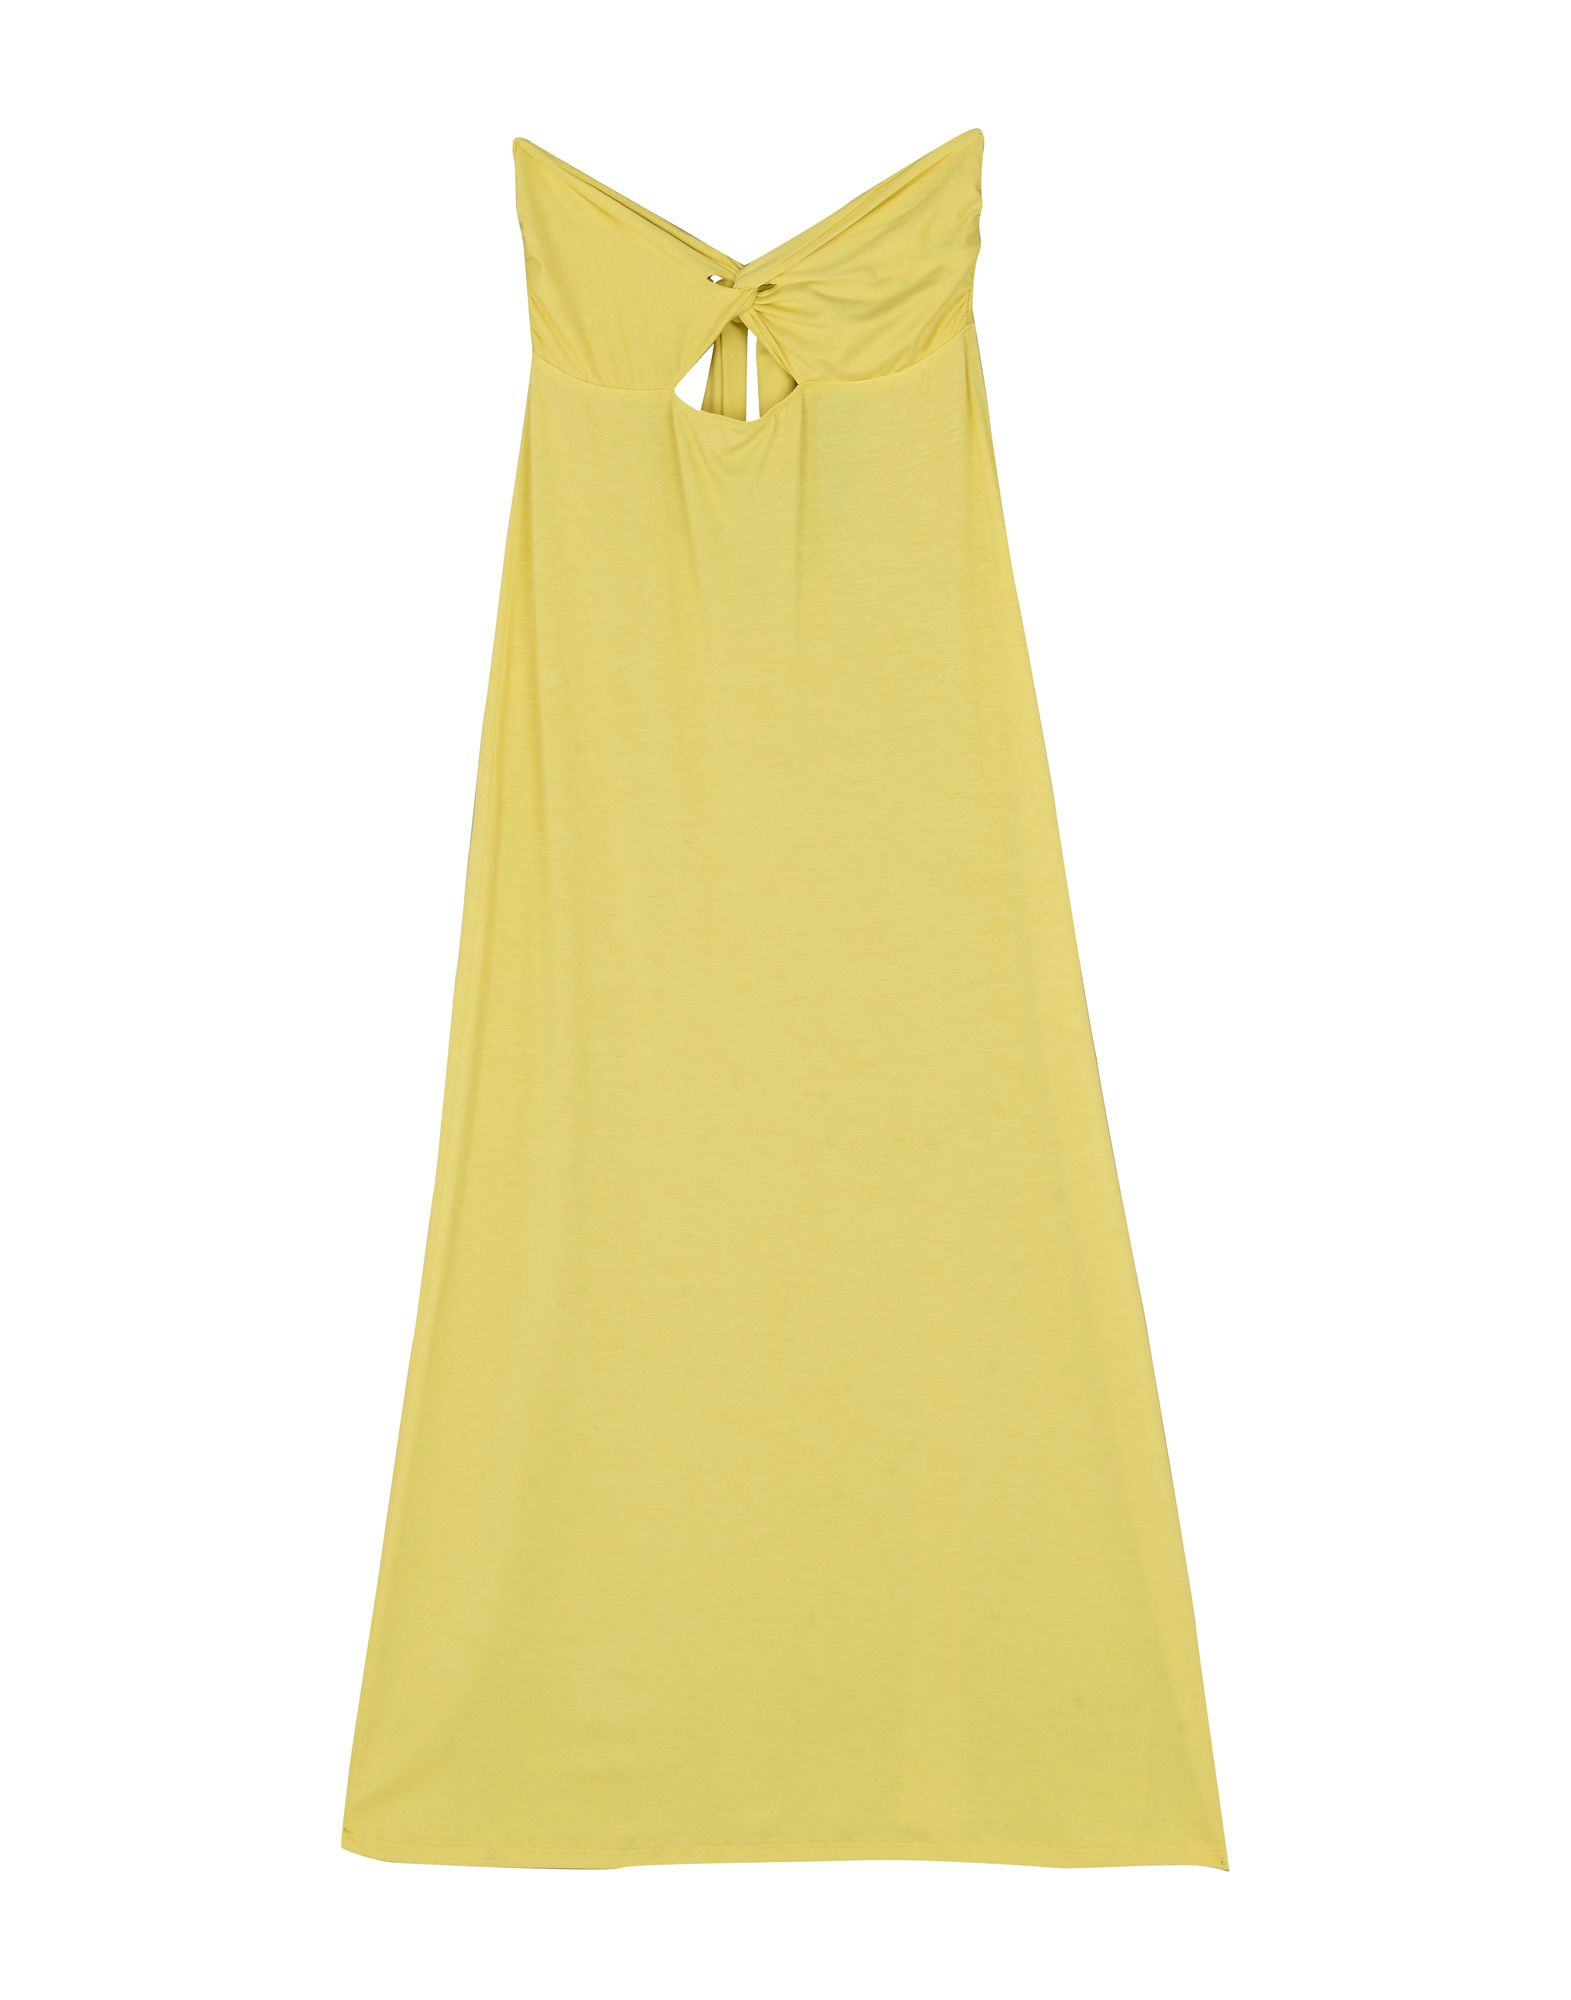 MISS NAORY Платье длиной 3/4 lisa corti платье длиной 3 4